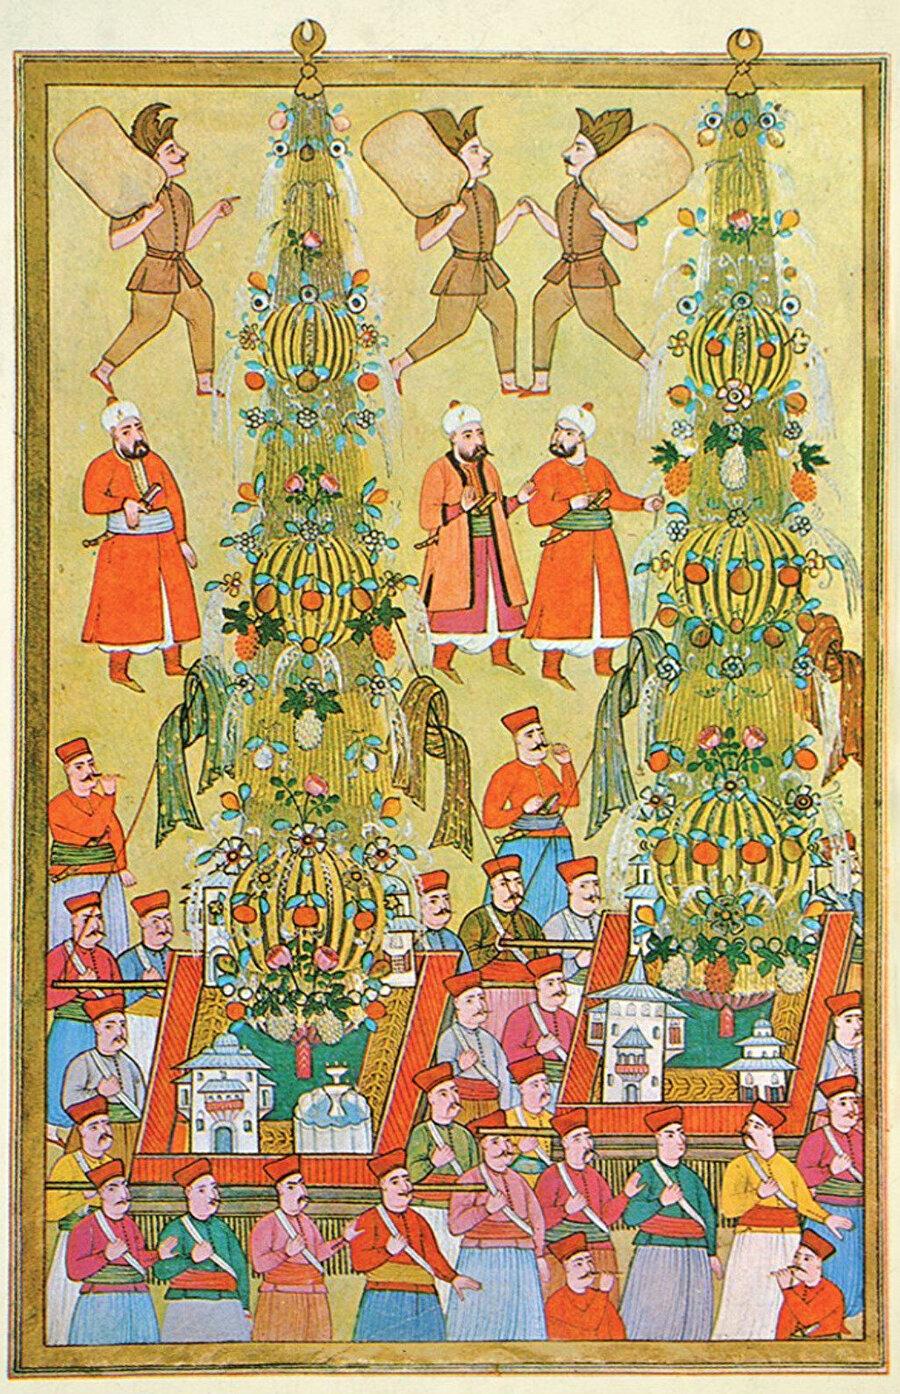 Bir başka sünnet alayında taşınan iki nahıl (Surnâme-i Vehbî, TSMK, III. Ahmed, nr. 3593, vr. 161a).